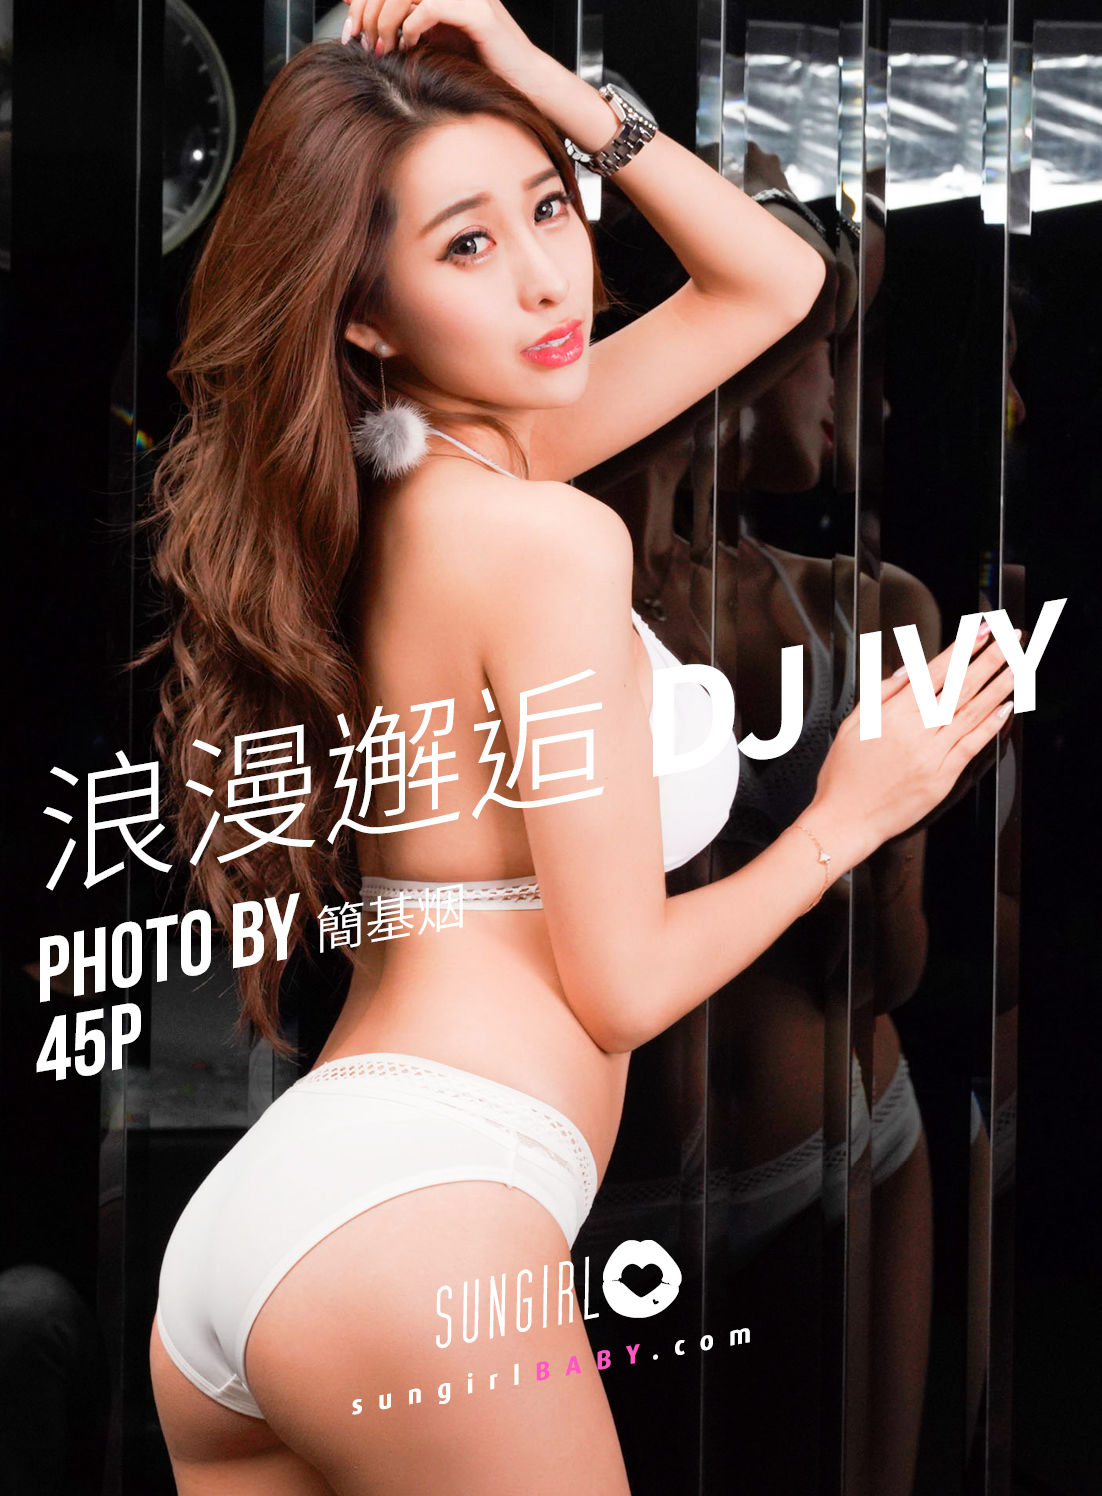 VOL.364 [阳光宝贝]福利大胸美乳:陈妘安(小雯Ivy)超高清个人性感漂亮大图(45P)